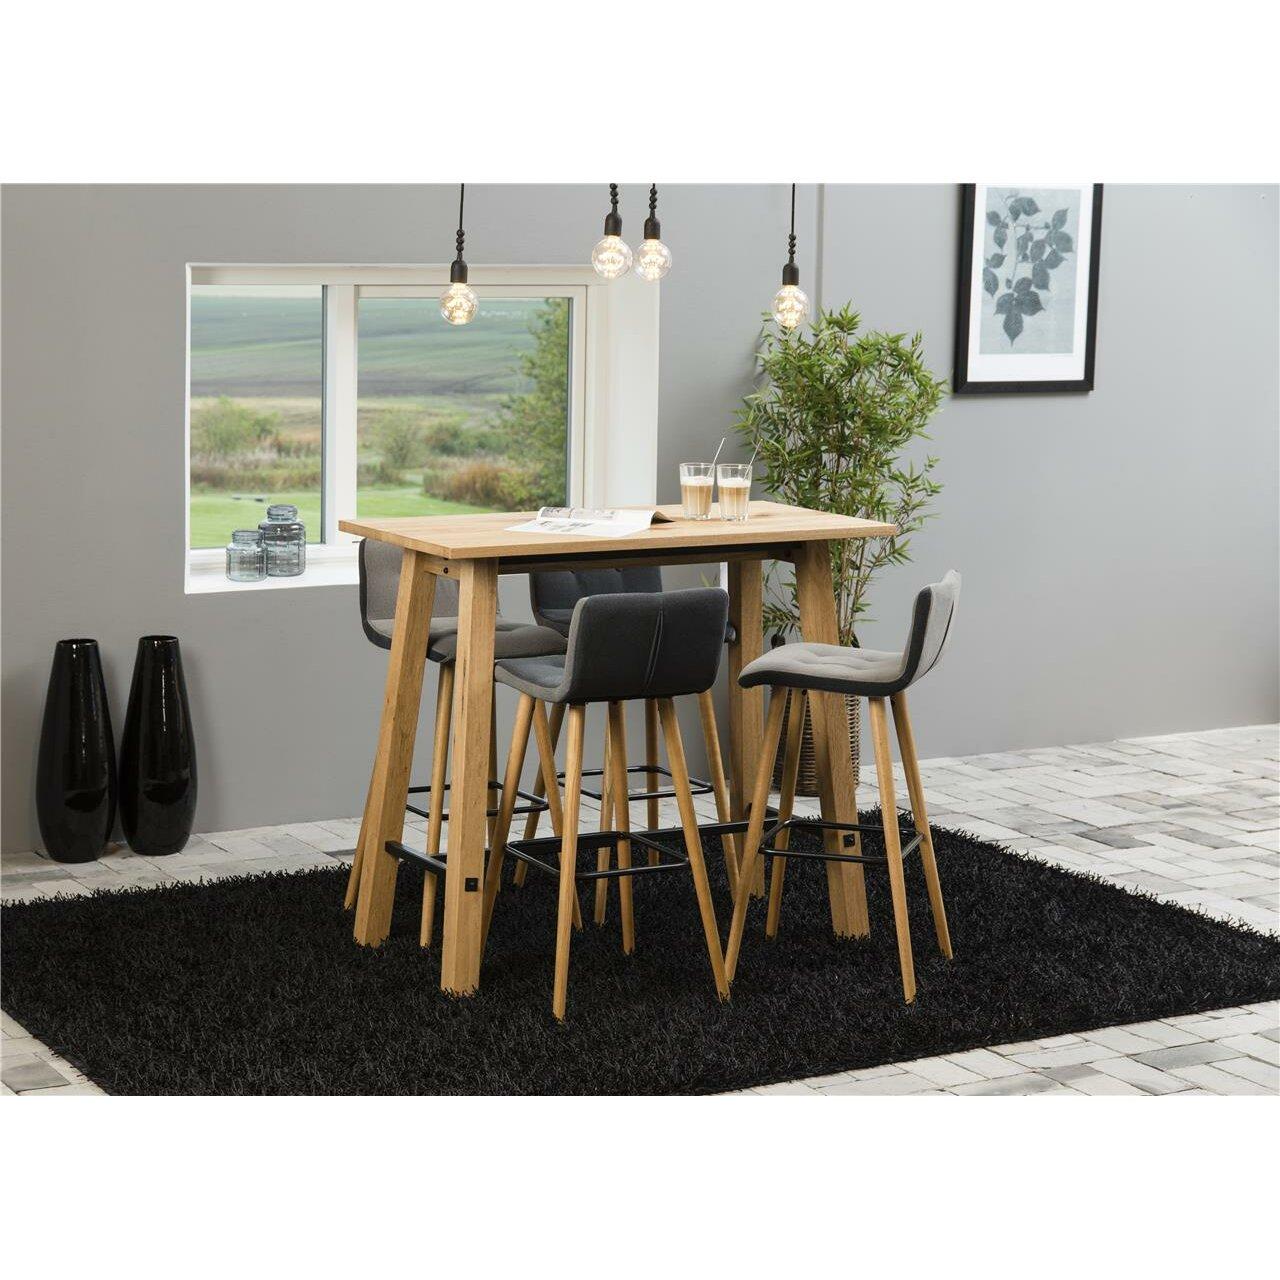 fj rde co gina bar table reviews. Black Bedroom Furniture Sets. Home Design Ideas